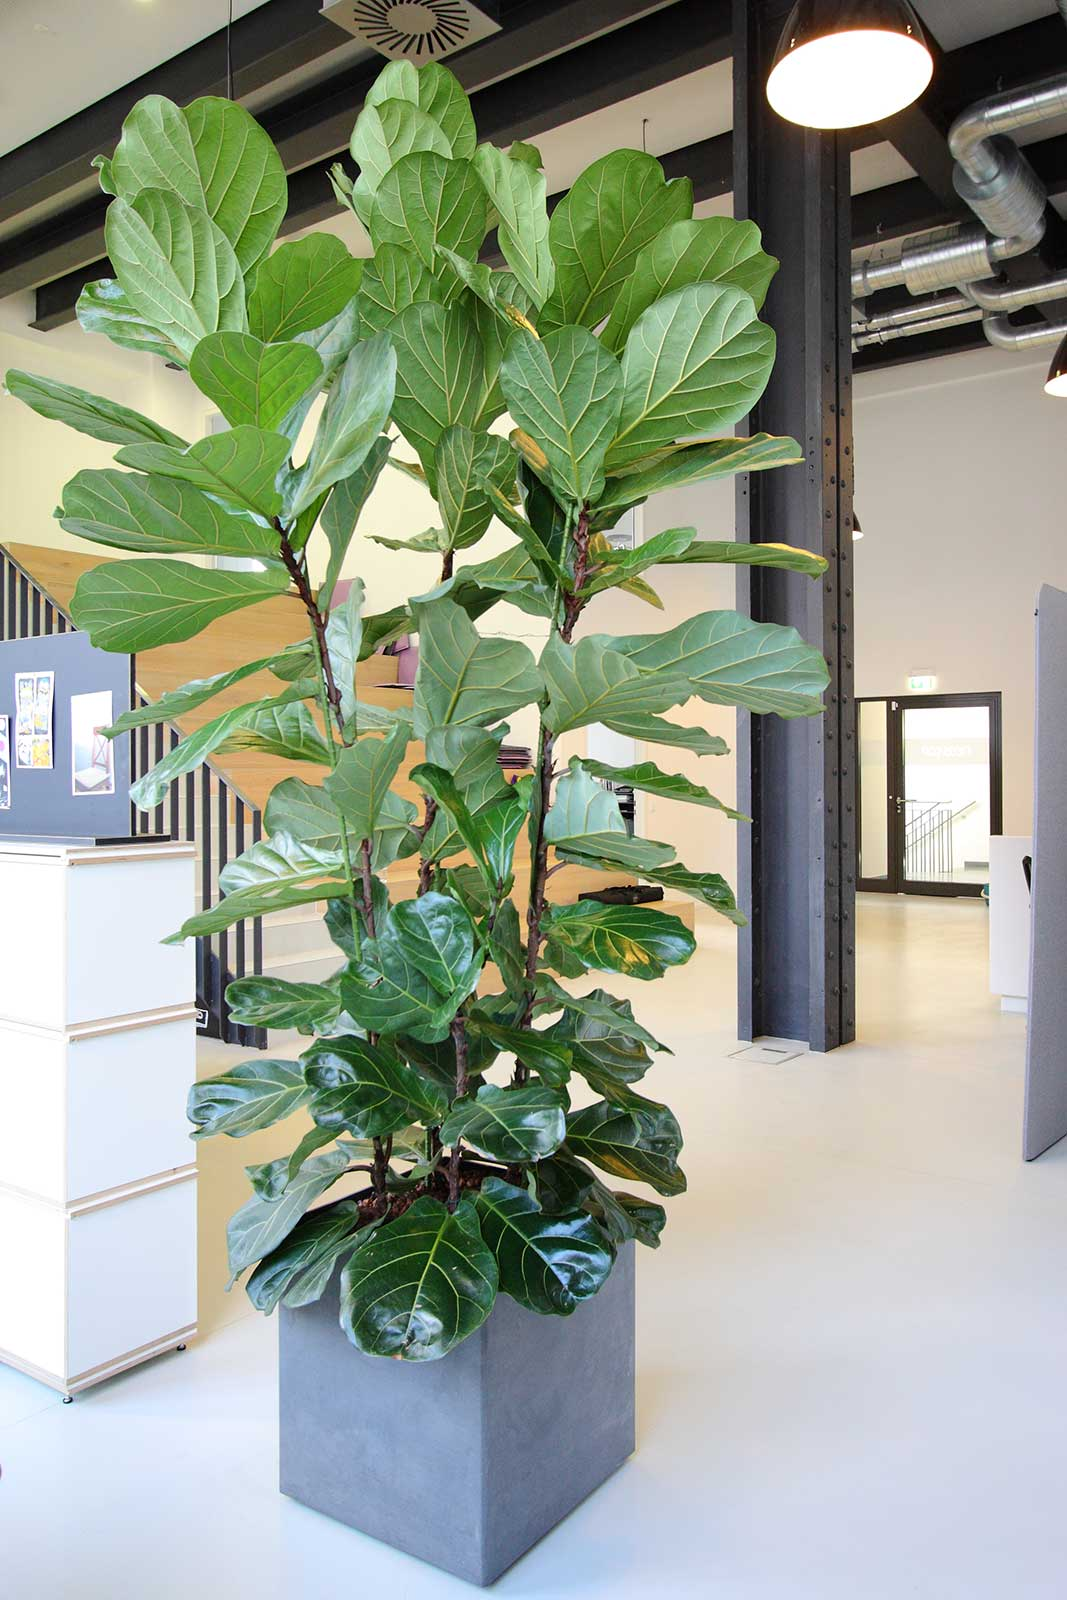 Ficus lyrata als Mietpflanze im Großraumbüro